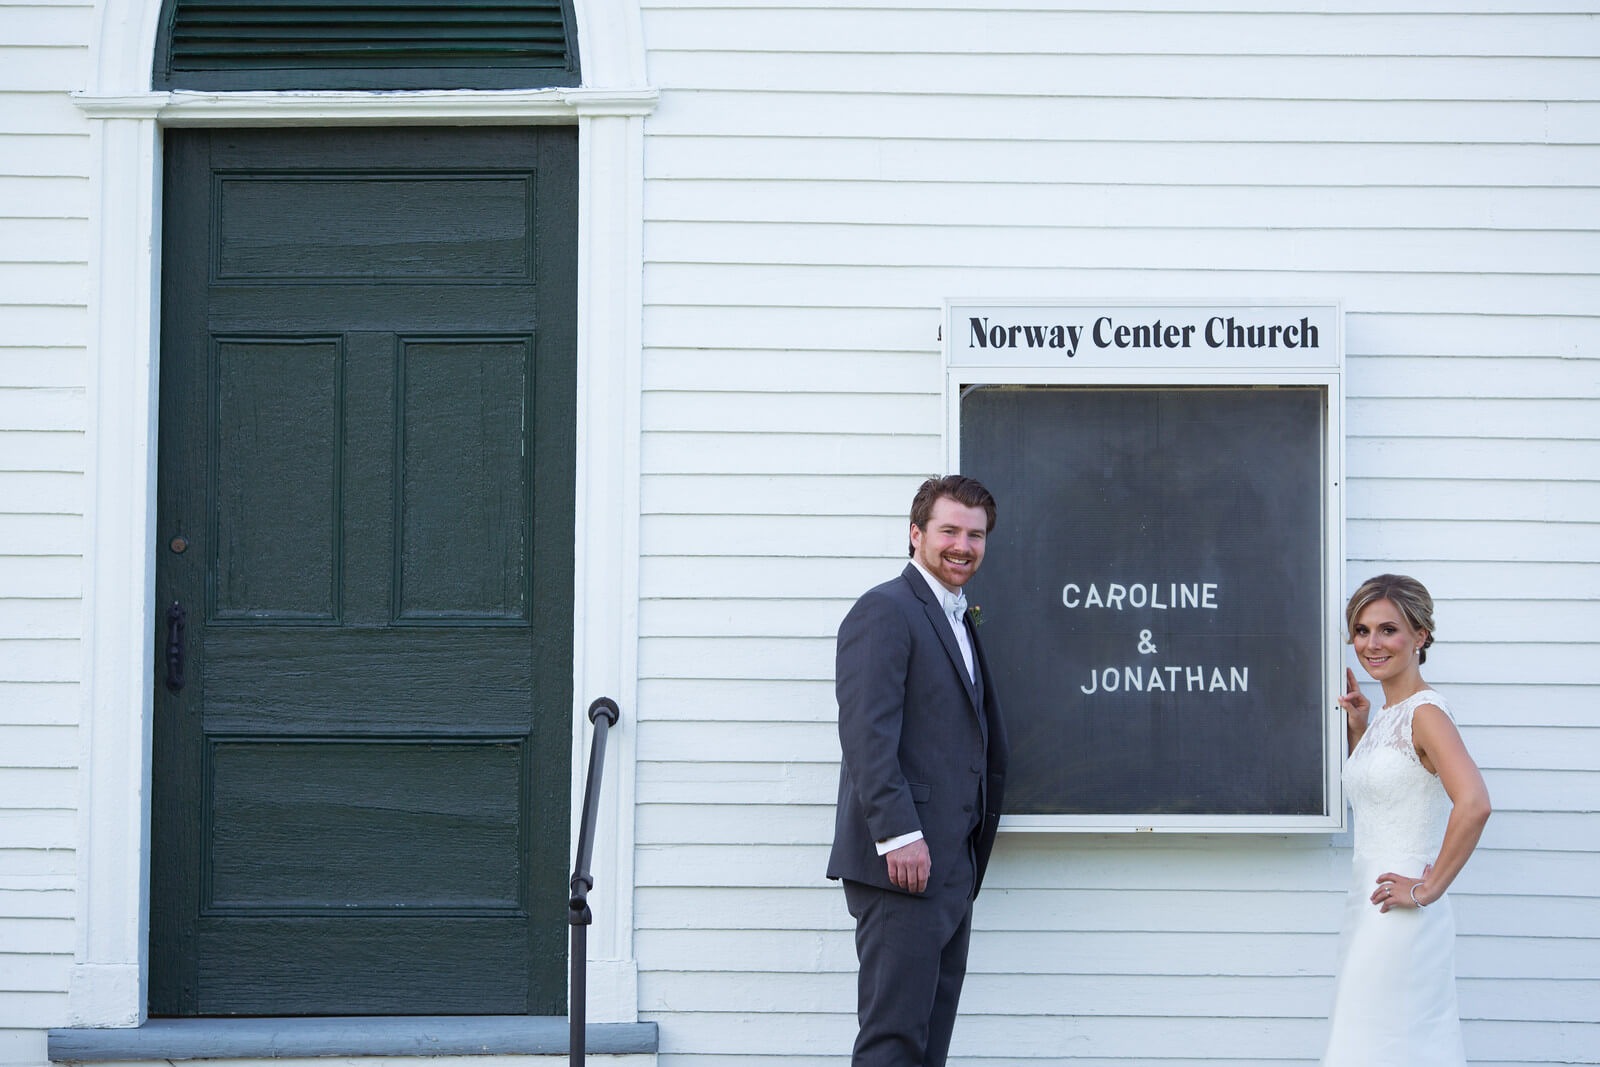 Norway Center Church